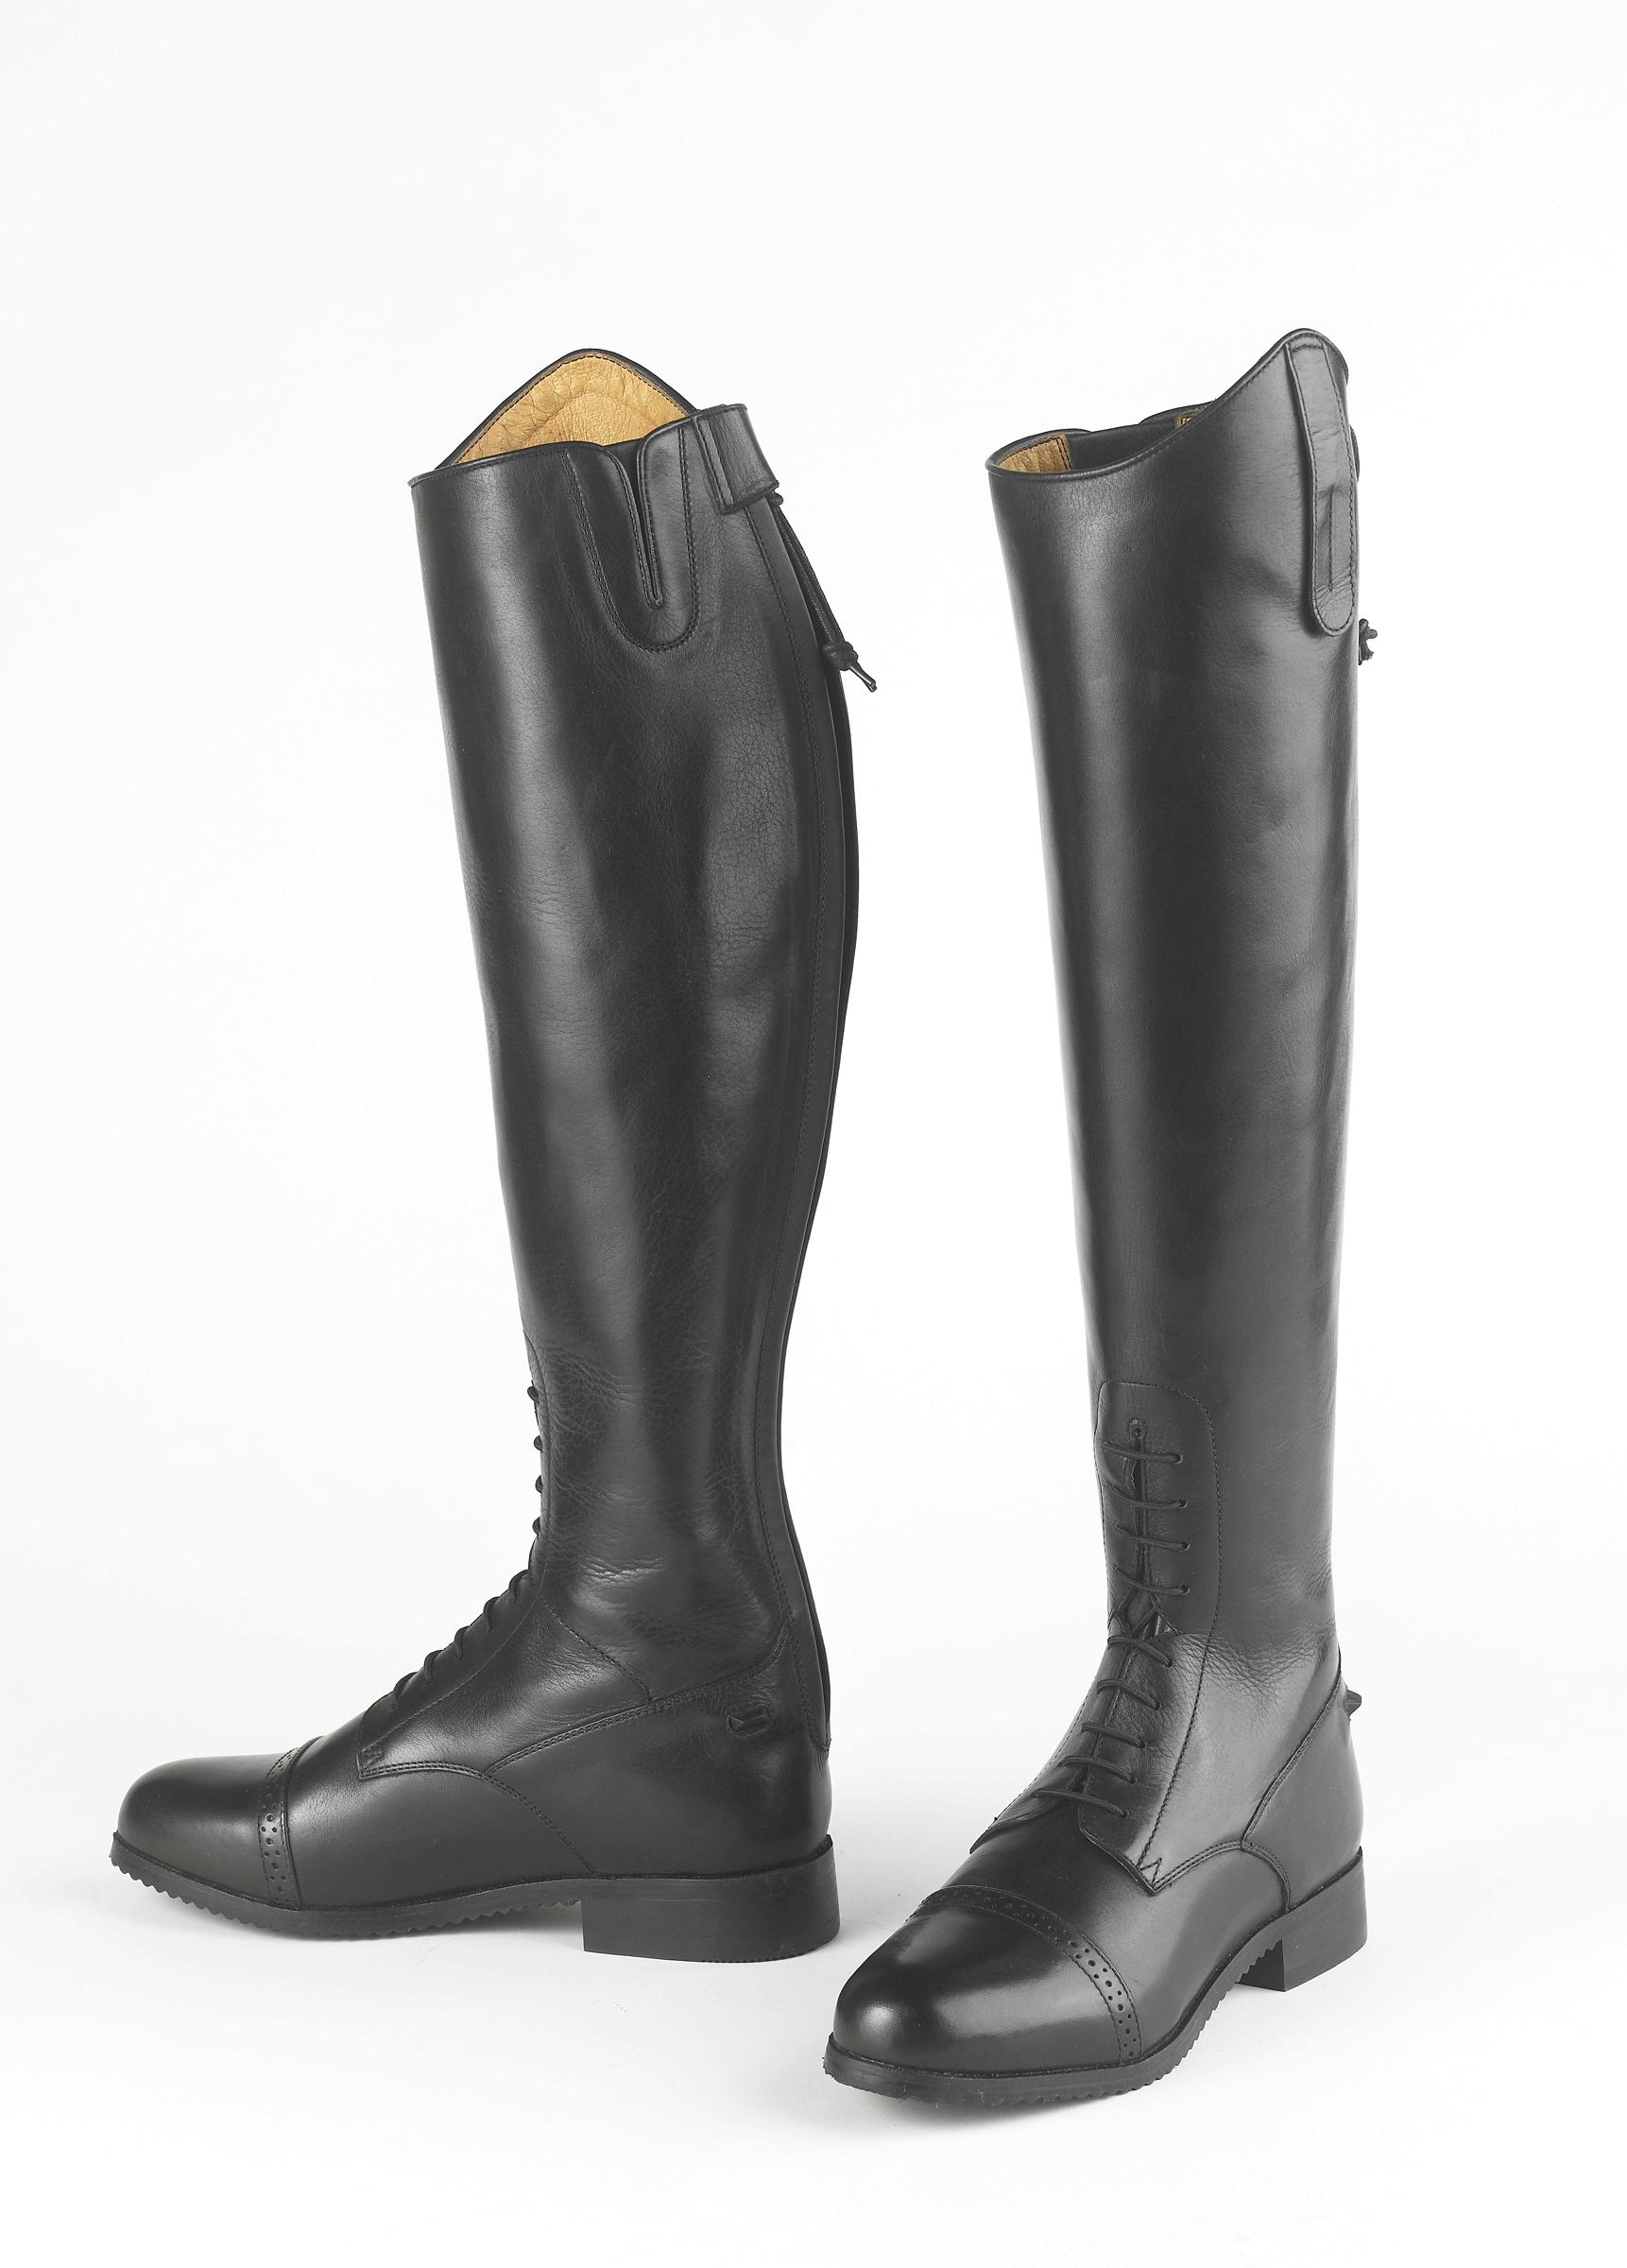 Ovation Ladies Tall Gold Pro Field Boots